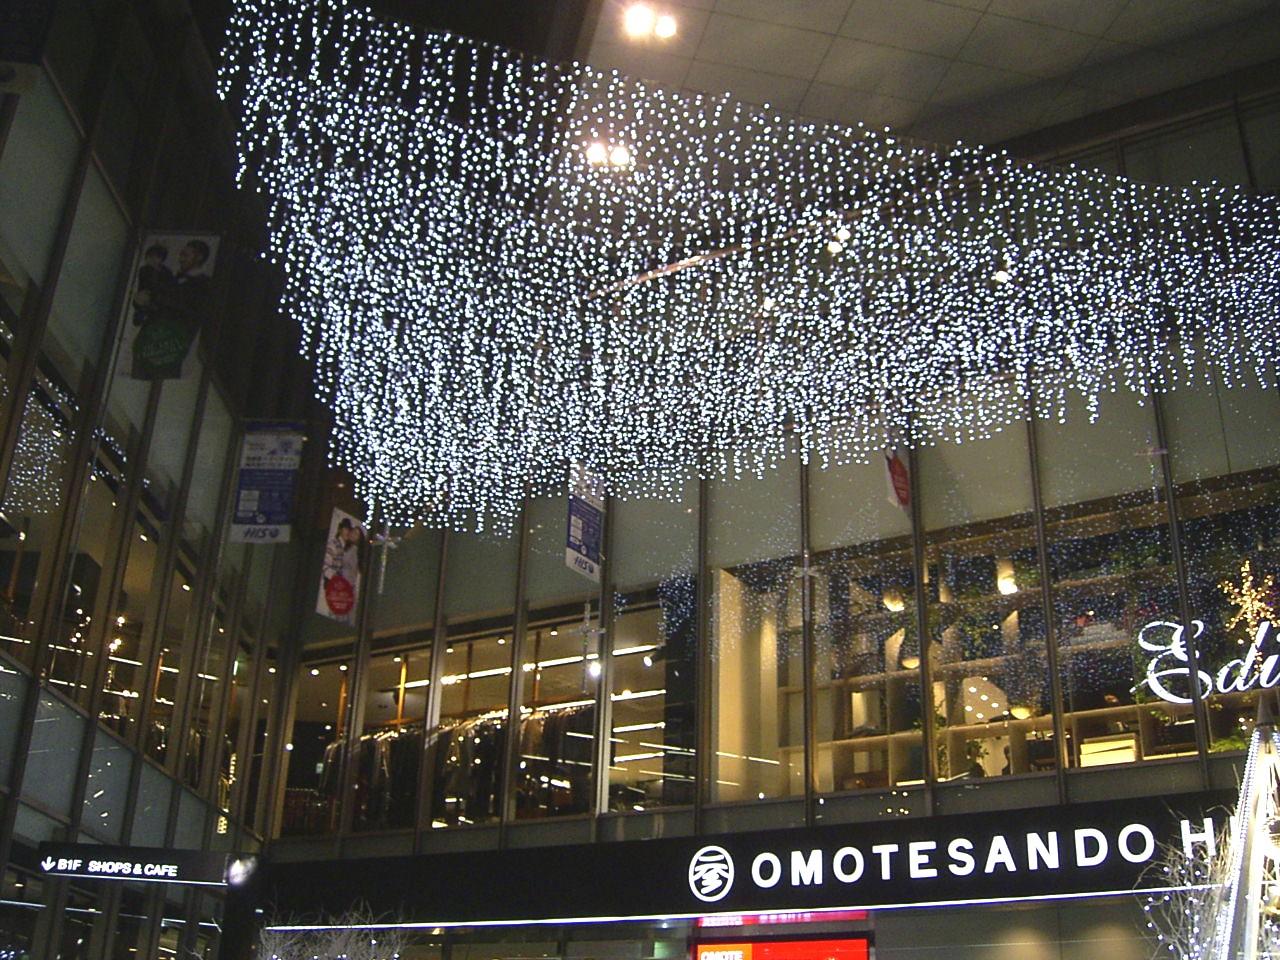 Omotesando_026